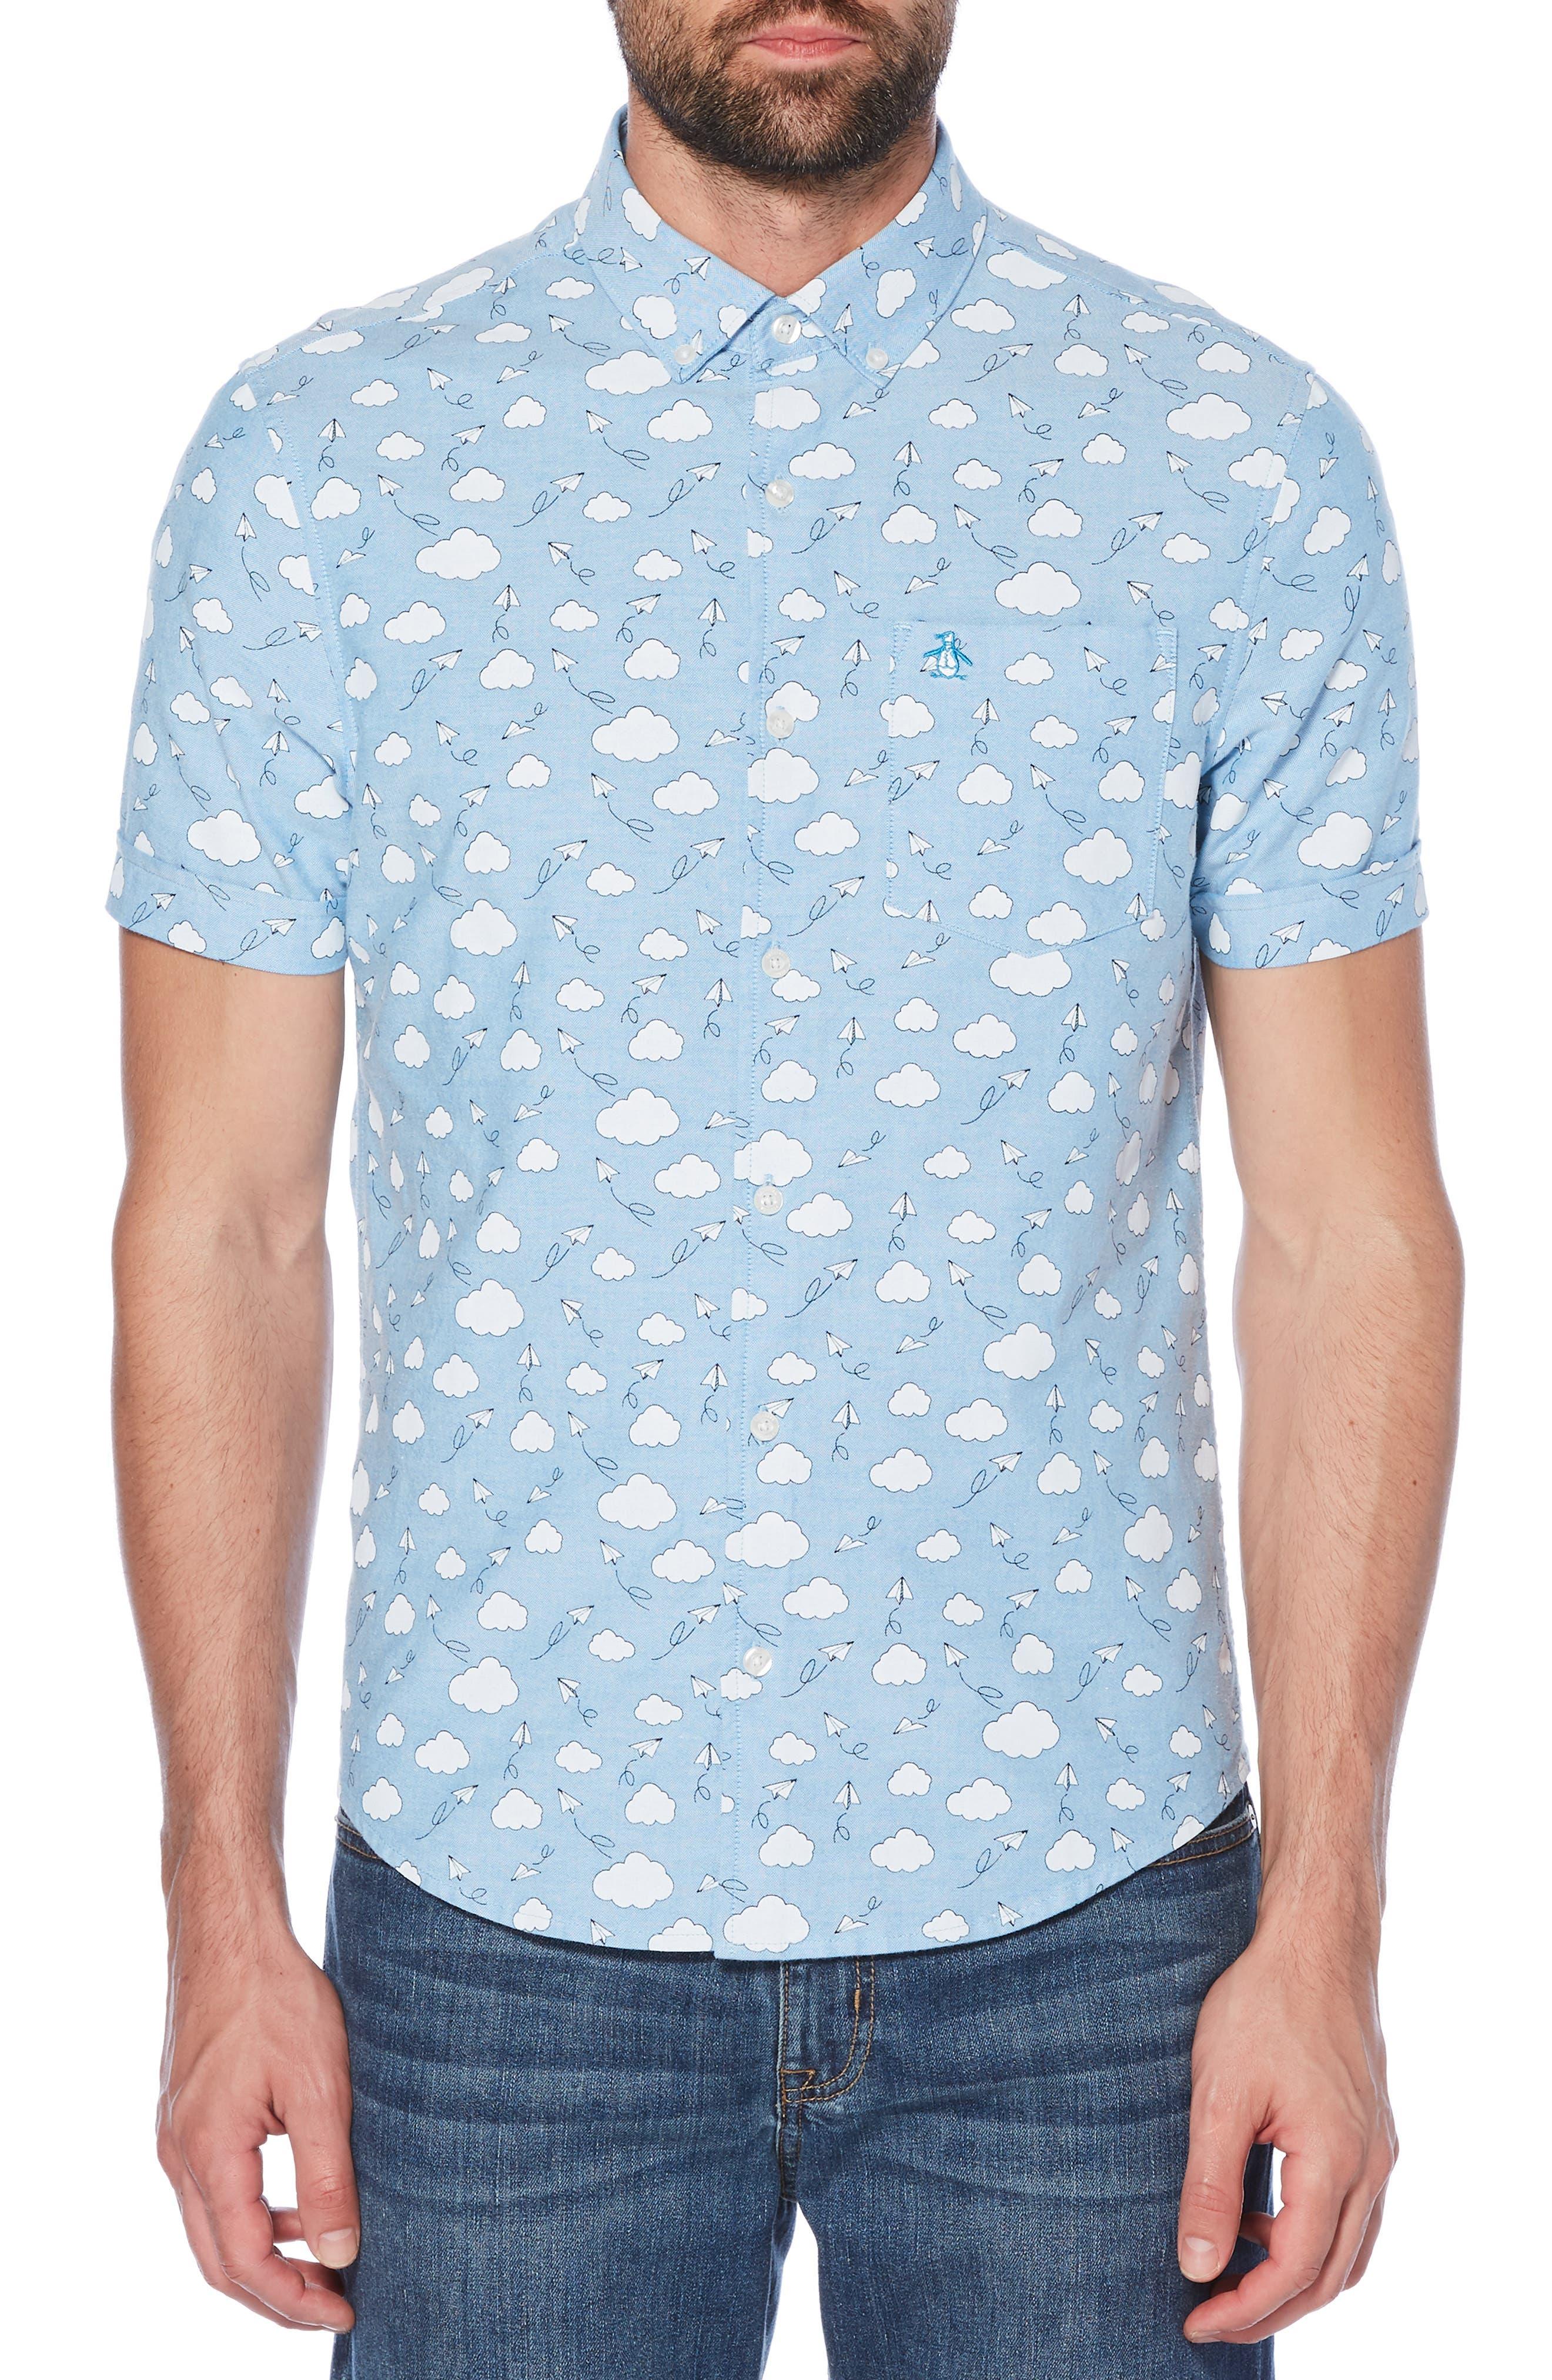 Cloud Print Oxford Shirt, Main, color, DIVA BLUE